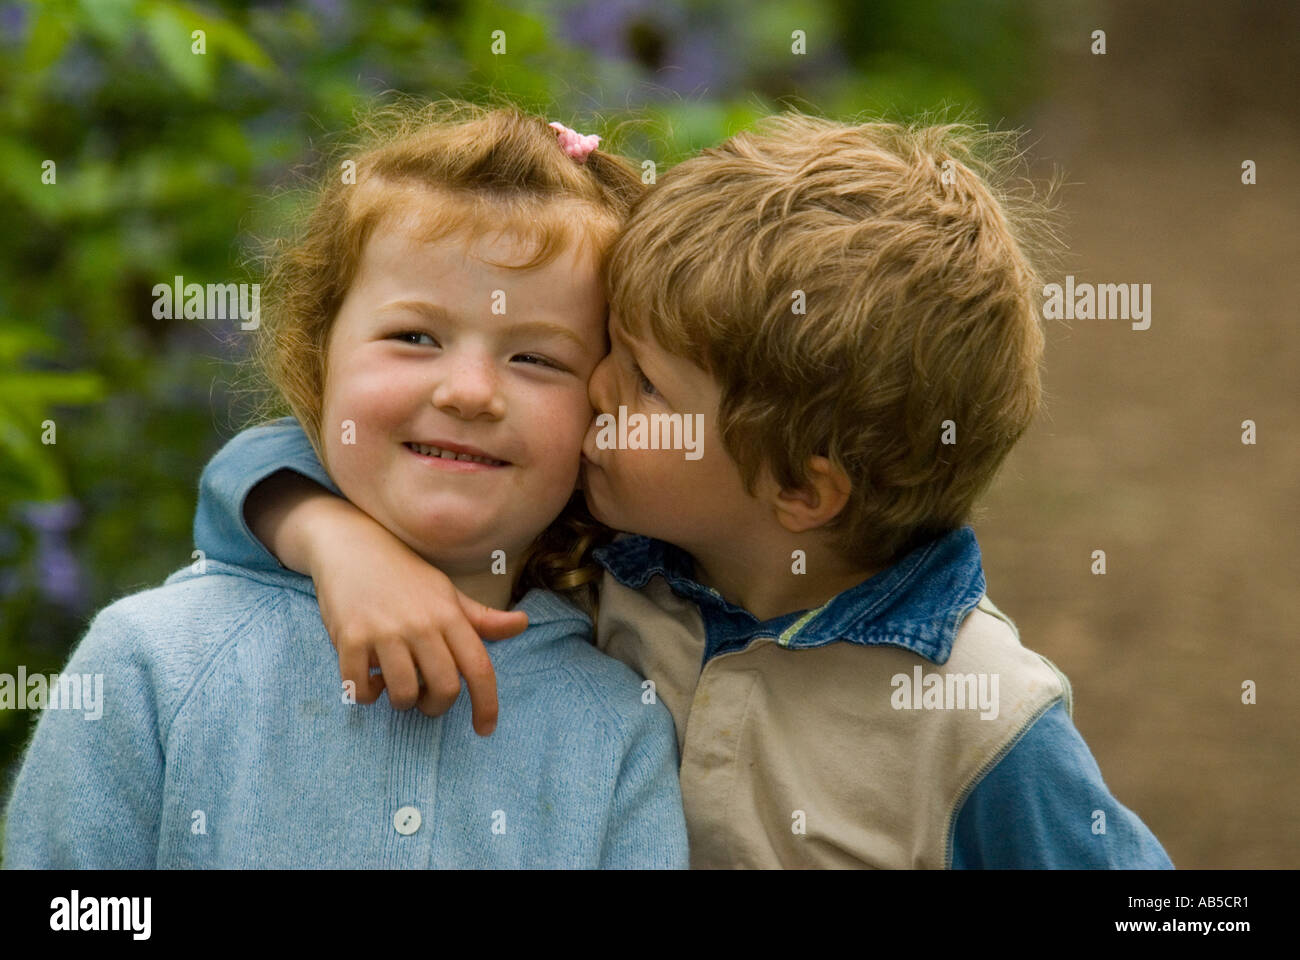 Girlboy Twins Cuddling Each Other Stock Photo 7304816 Alamy